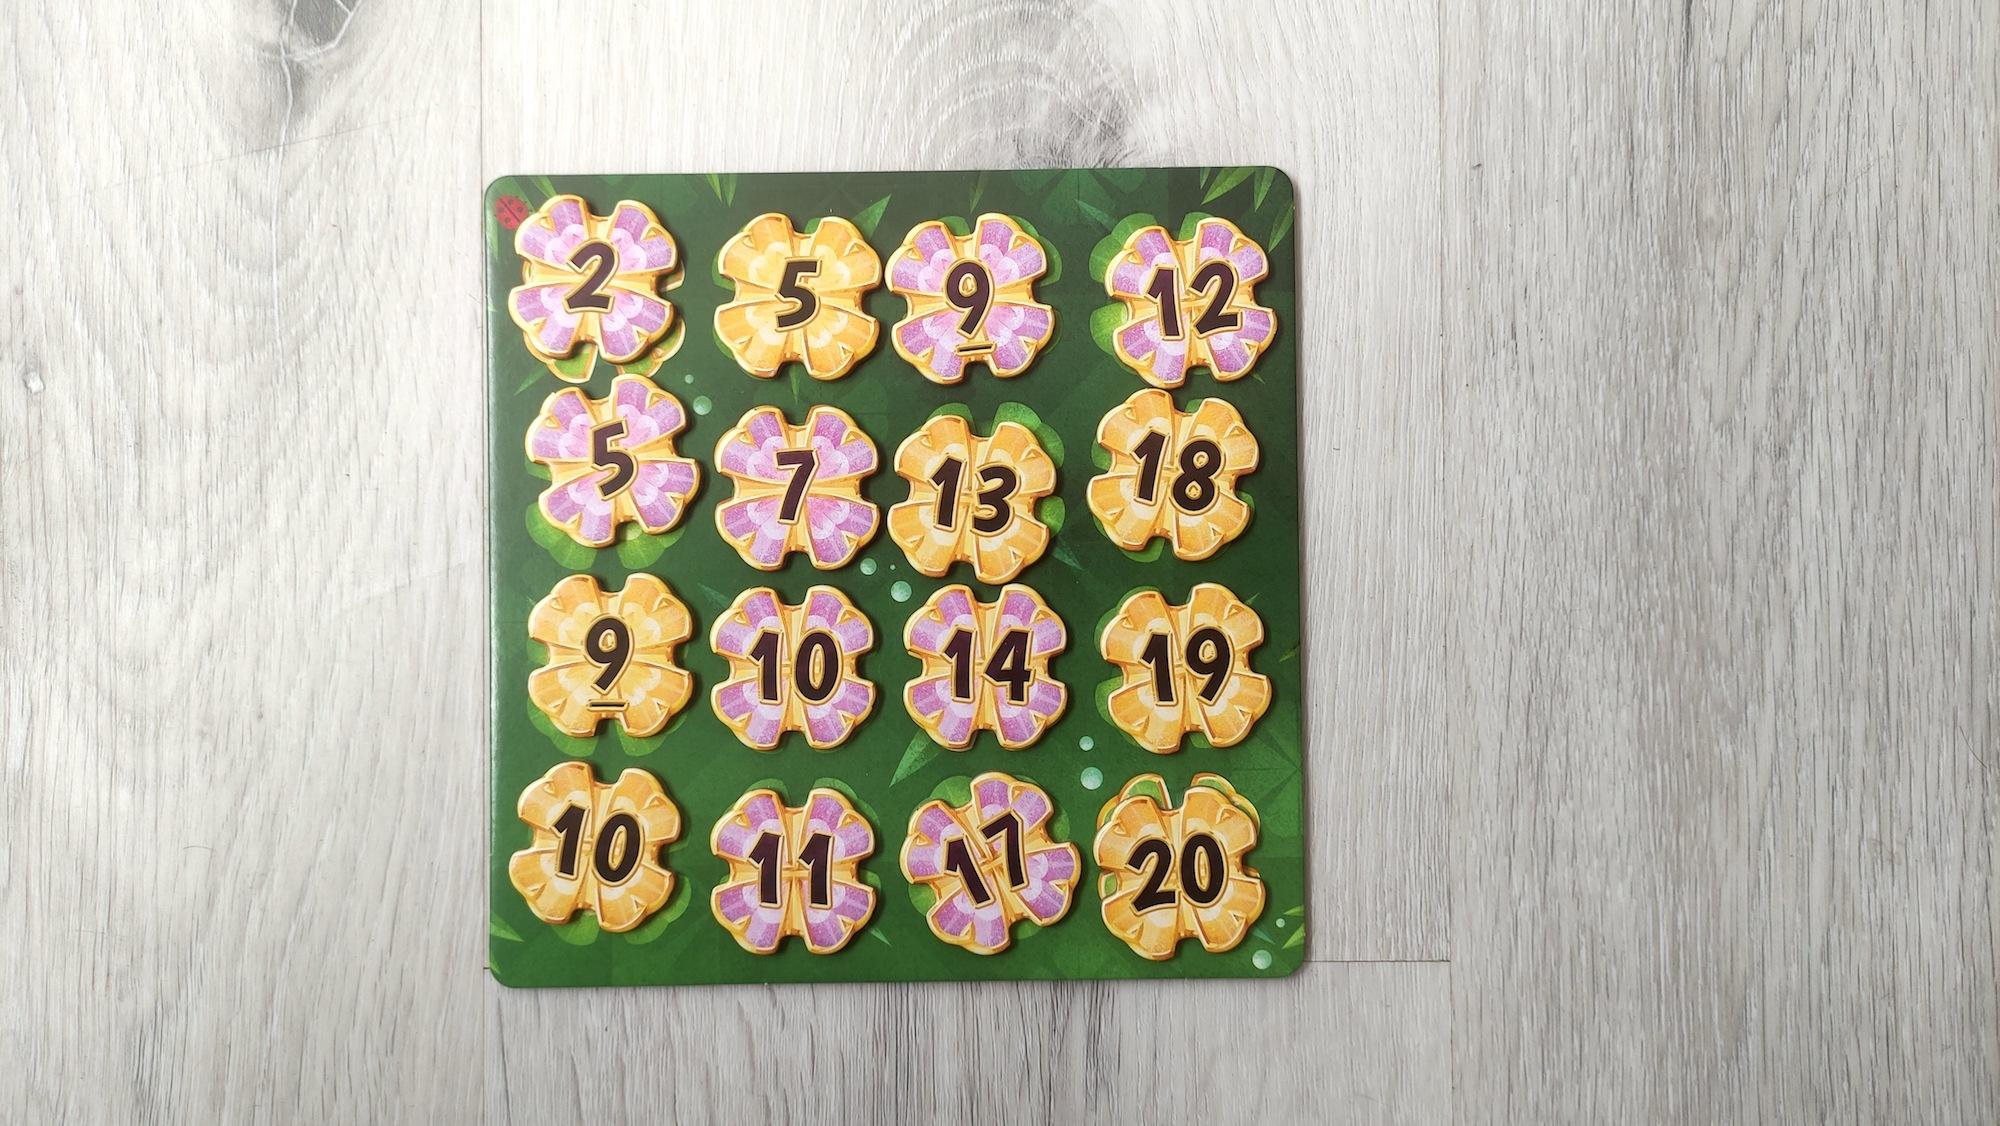 lucky-numbers-jeu-avis-test-8